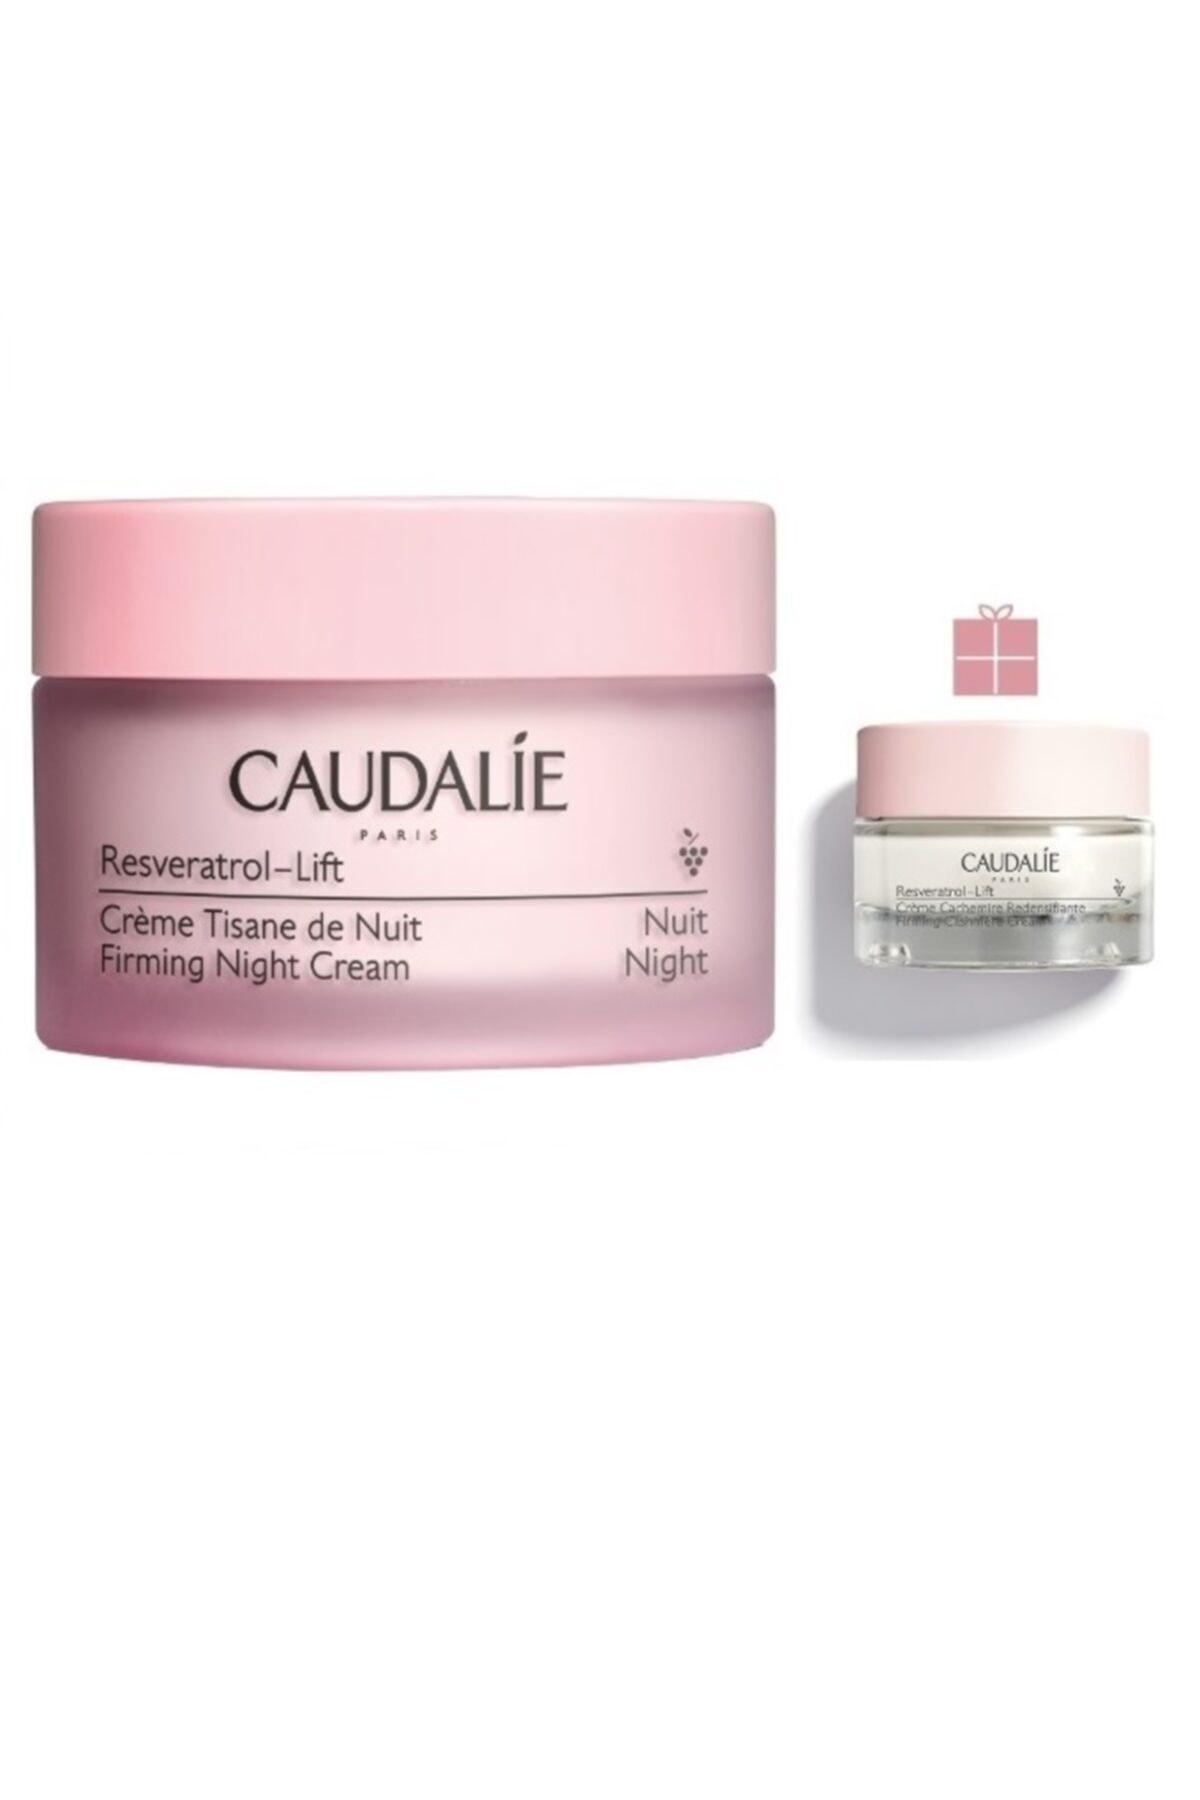 Caudalie Resveratrol Lift Firming Night Cream 50 ml 1